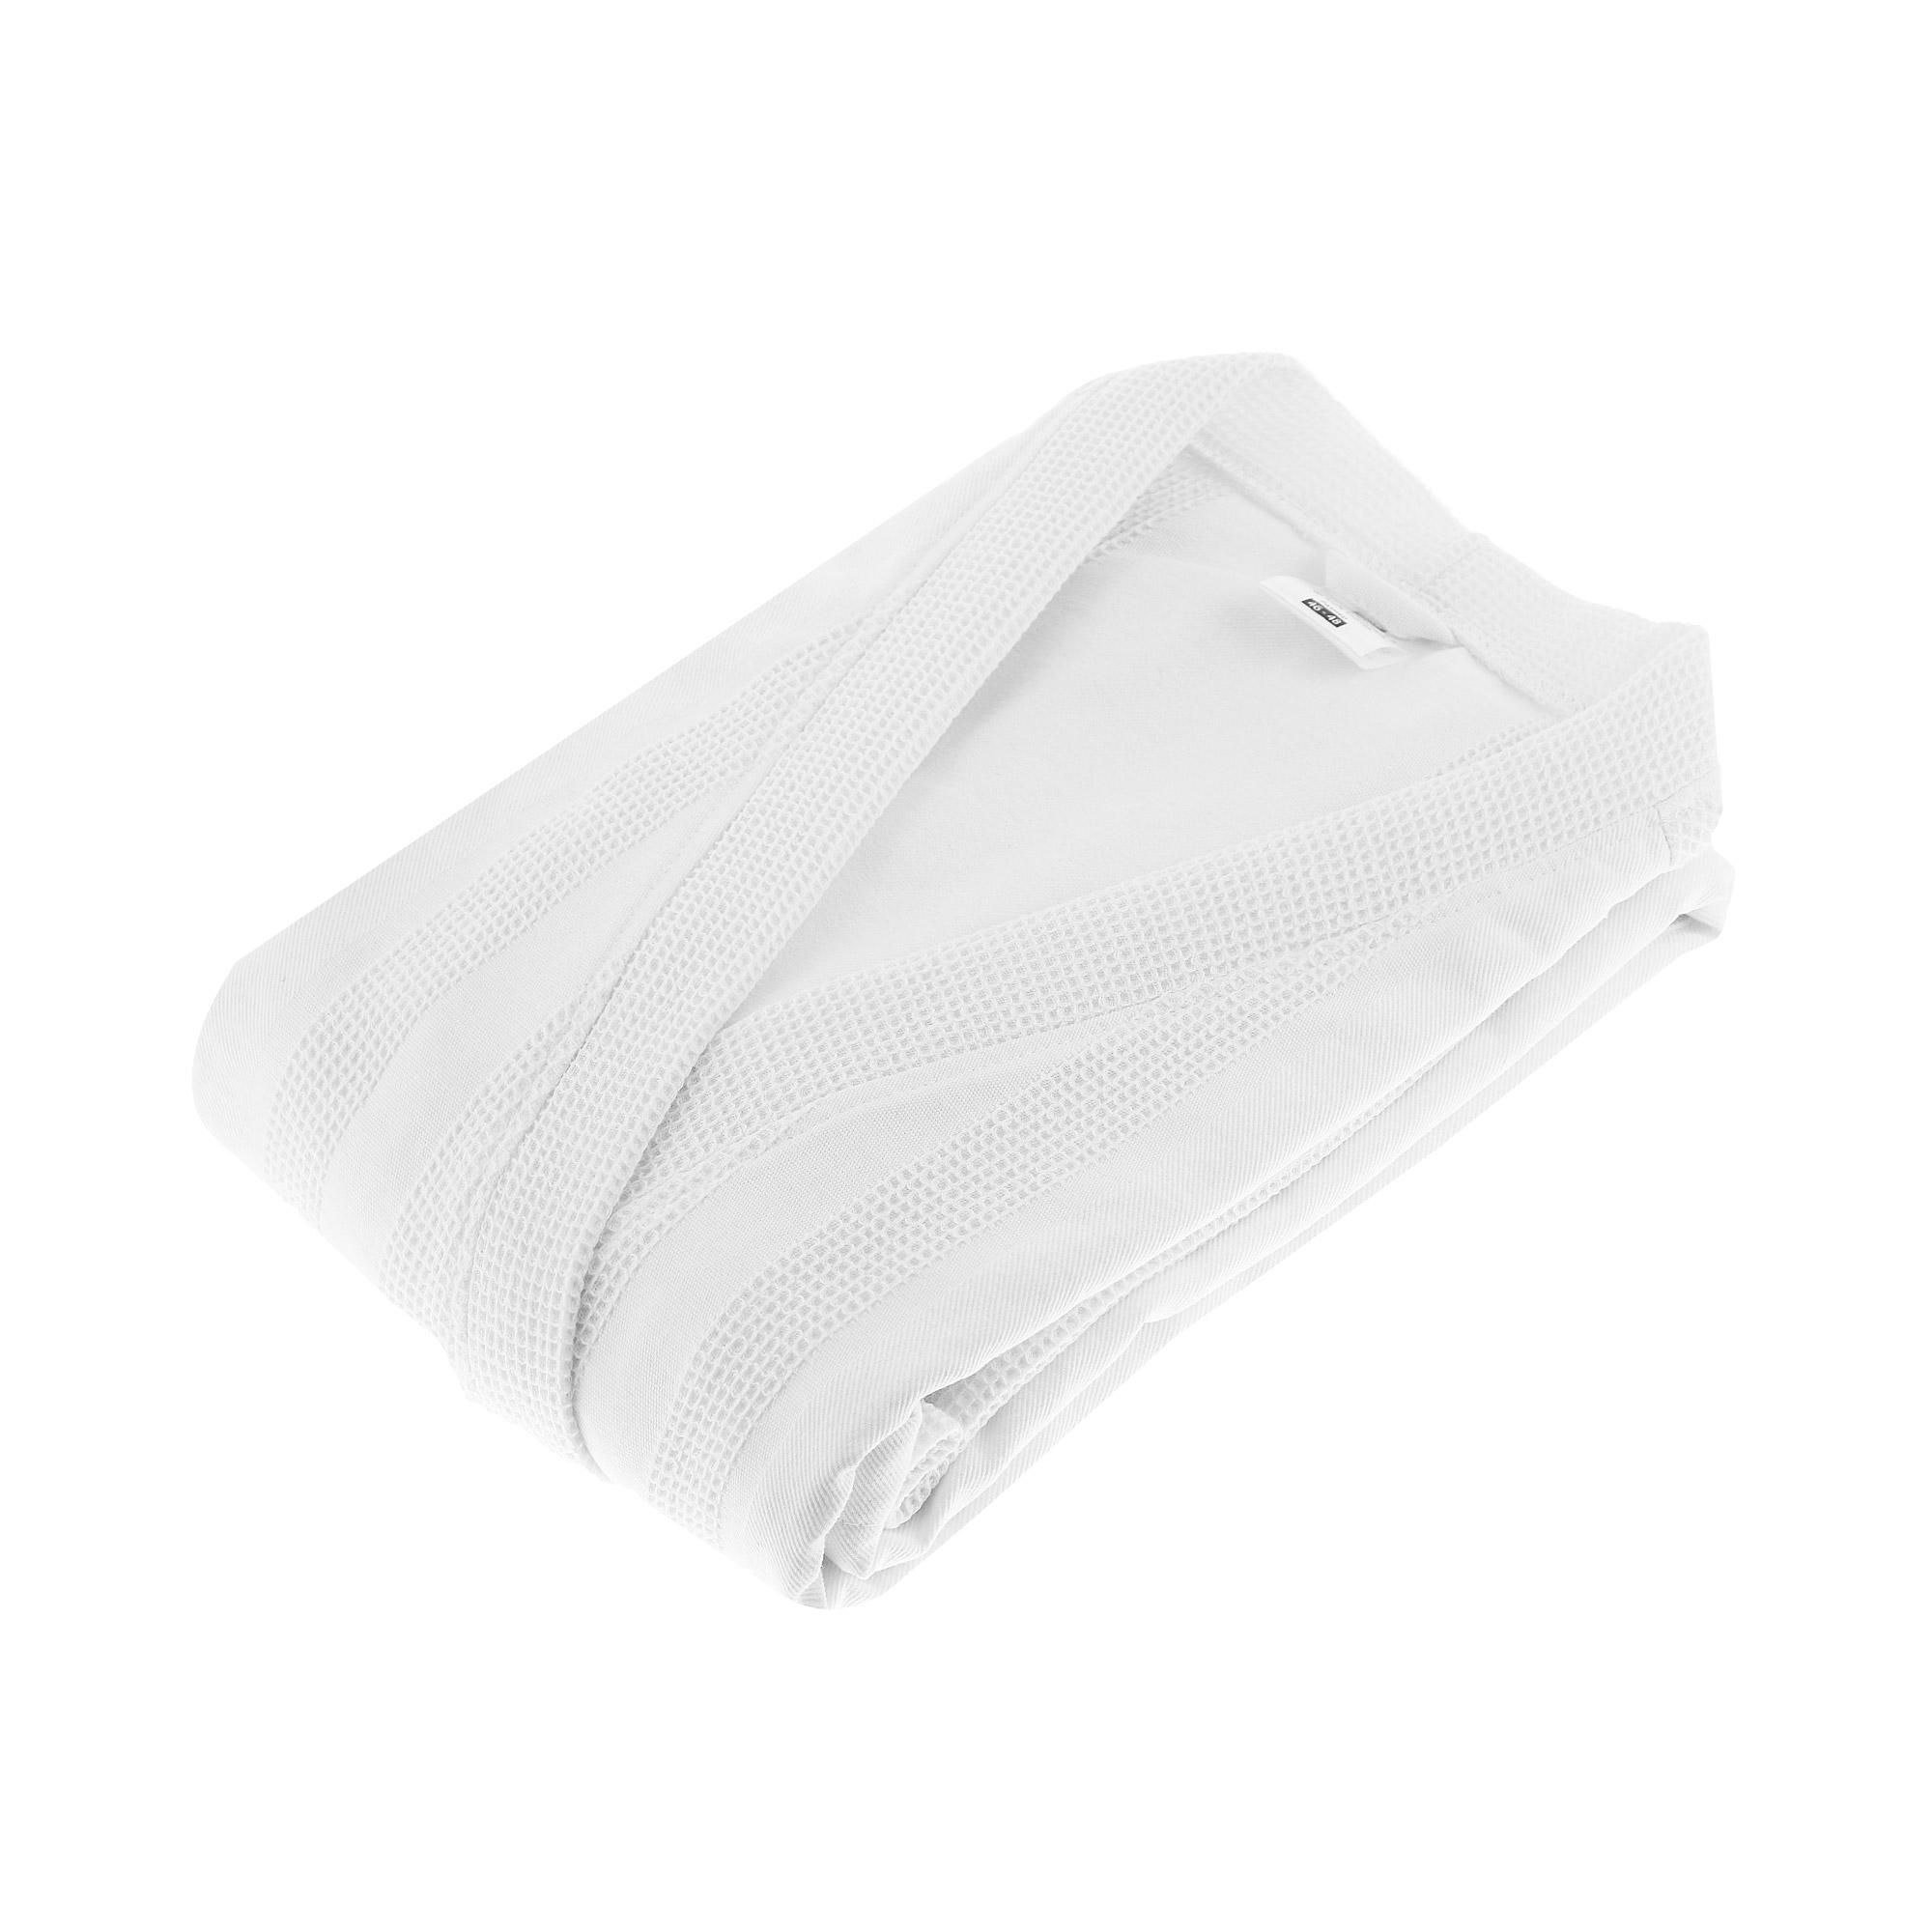 Халат Home style белый вафельный 46-48